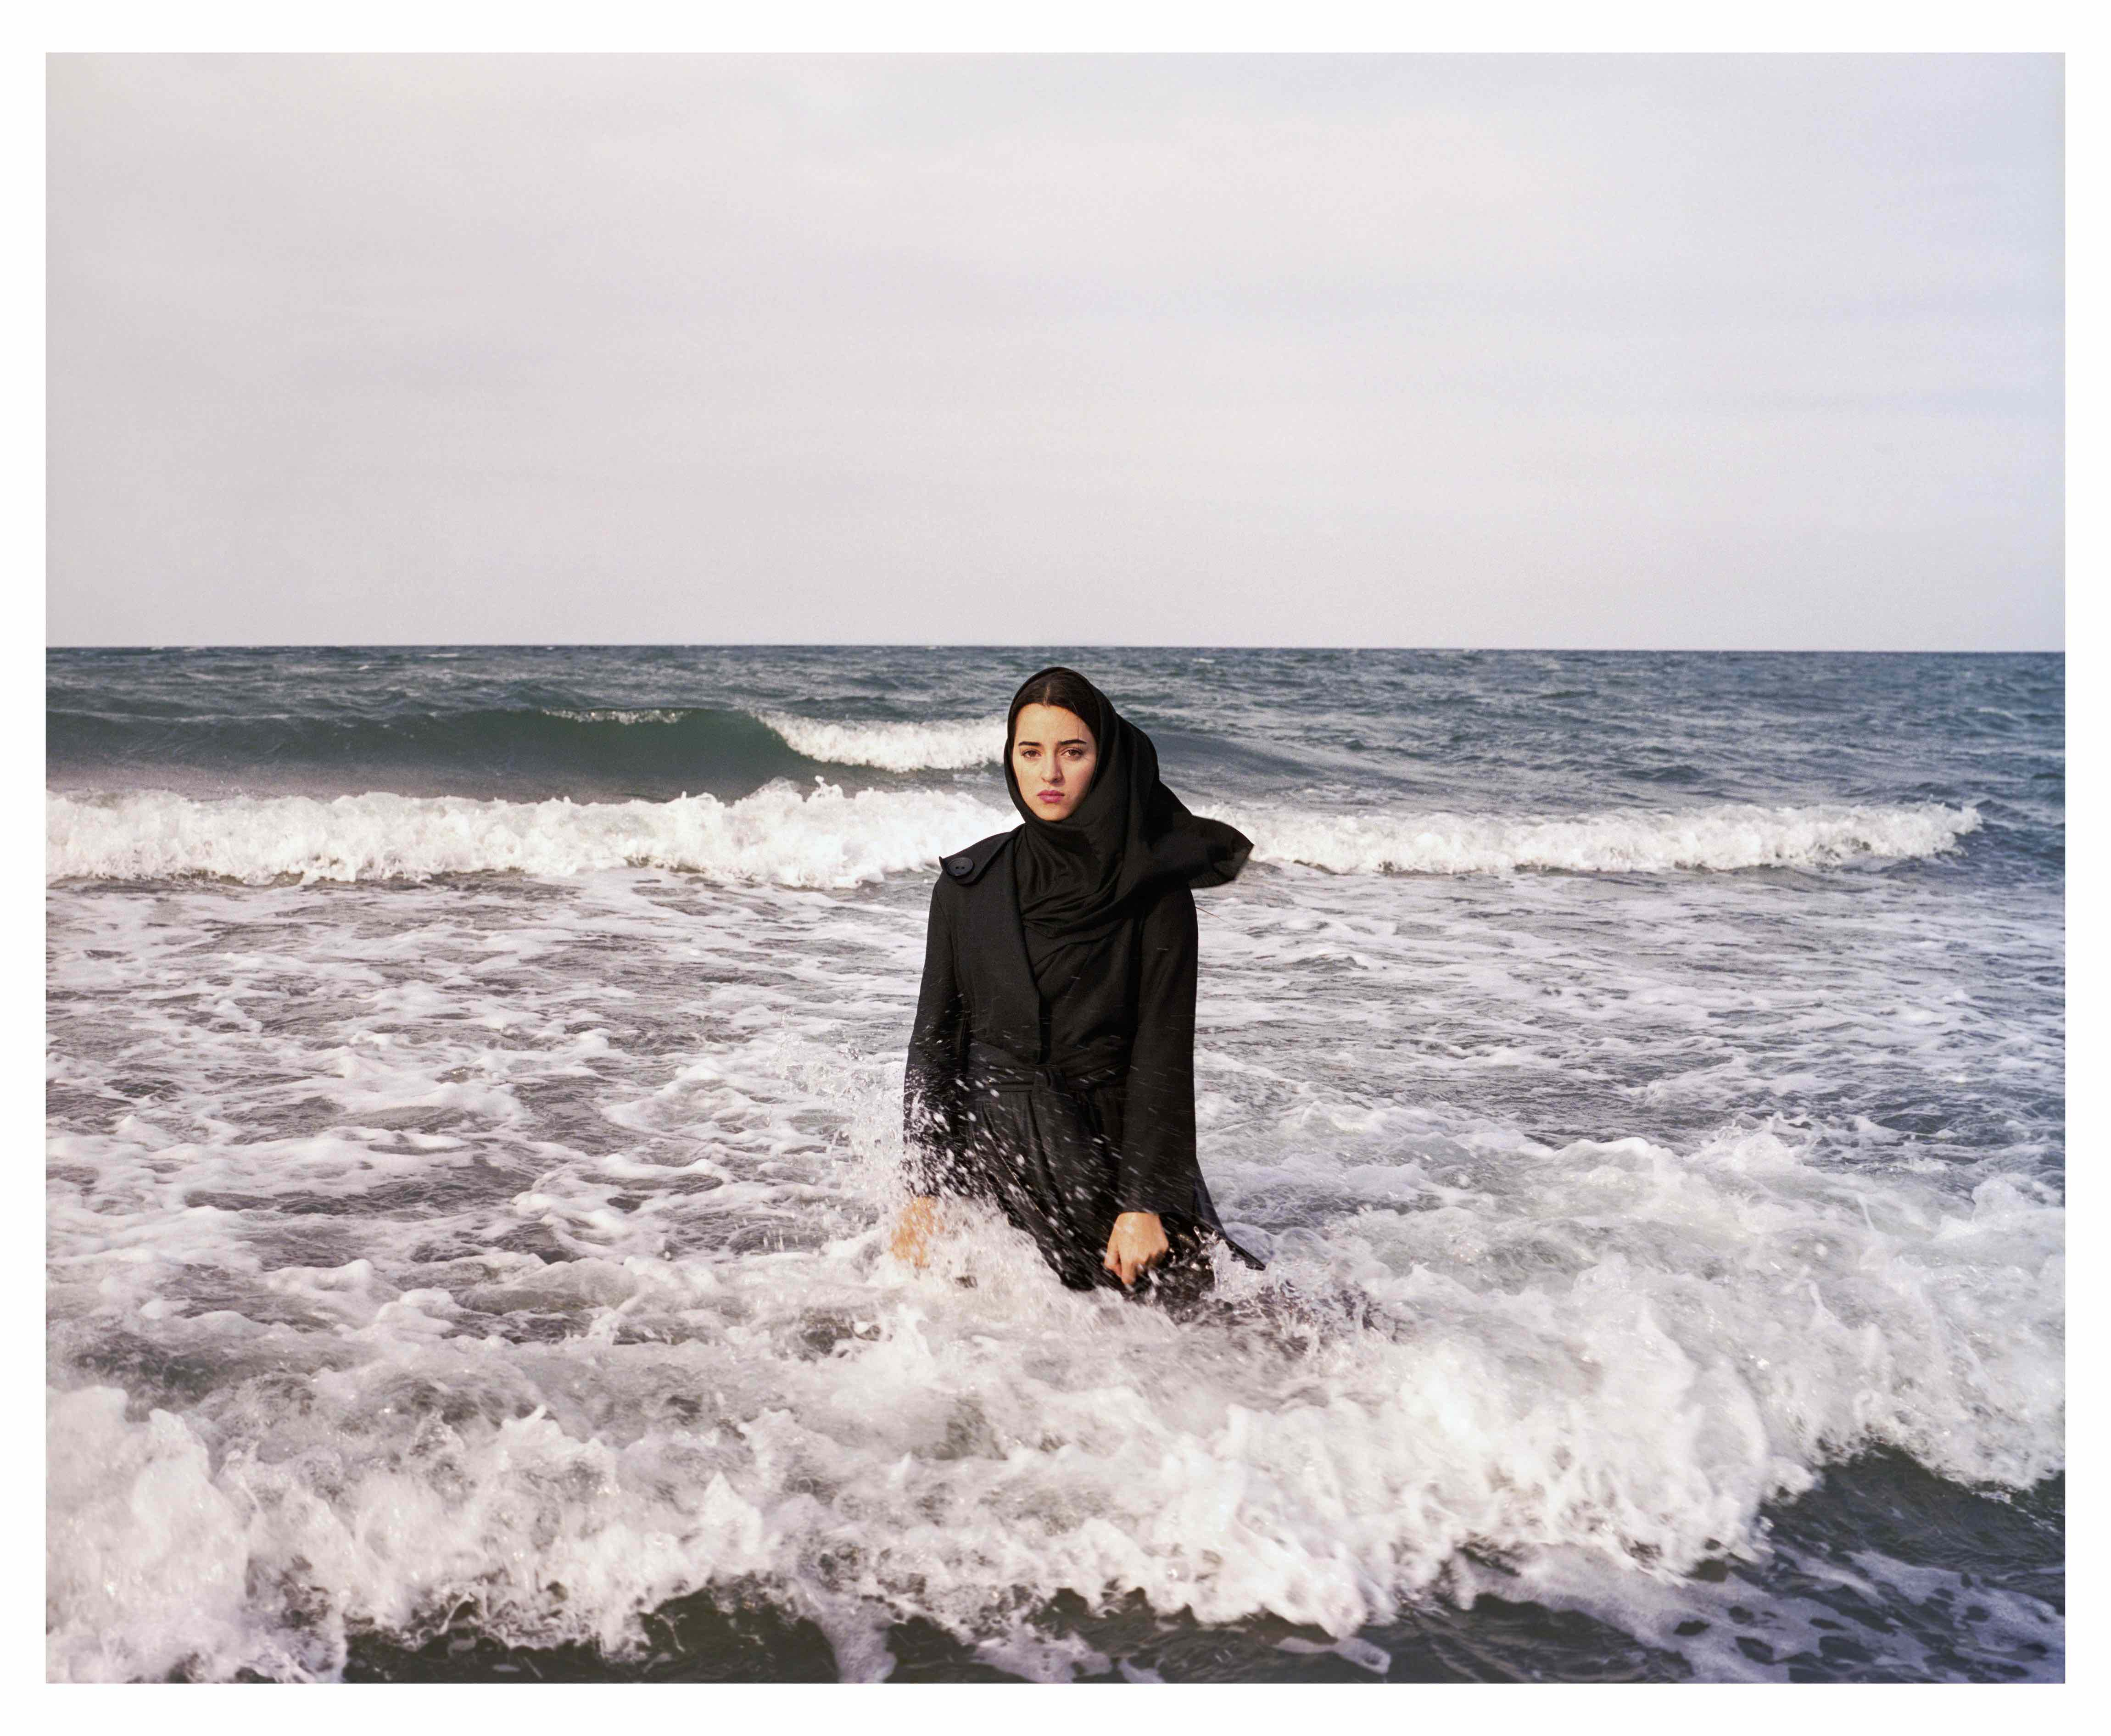 Iran. Mahmoudabad. Caspian Sea. 2011. Imaginary CD cover for Sahar © Newsha Tavakolian / Magnum Photos